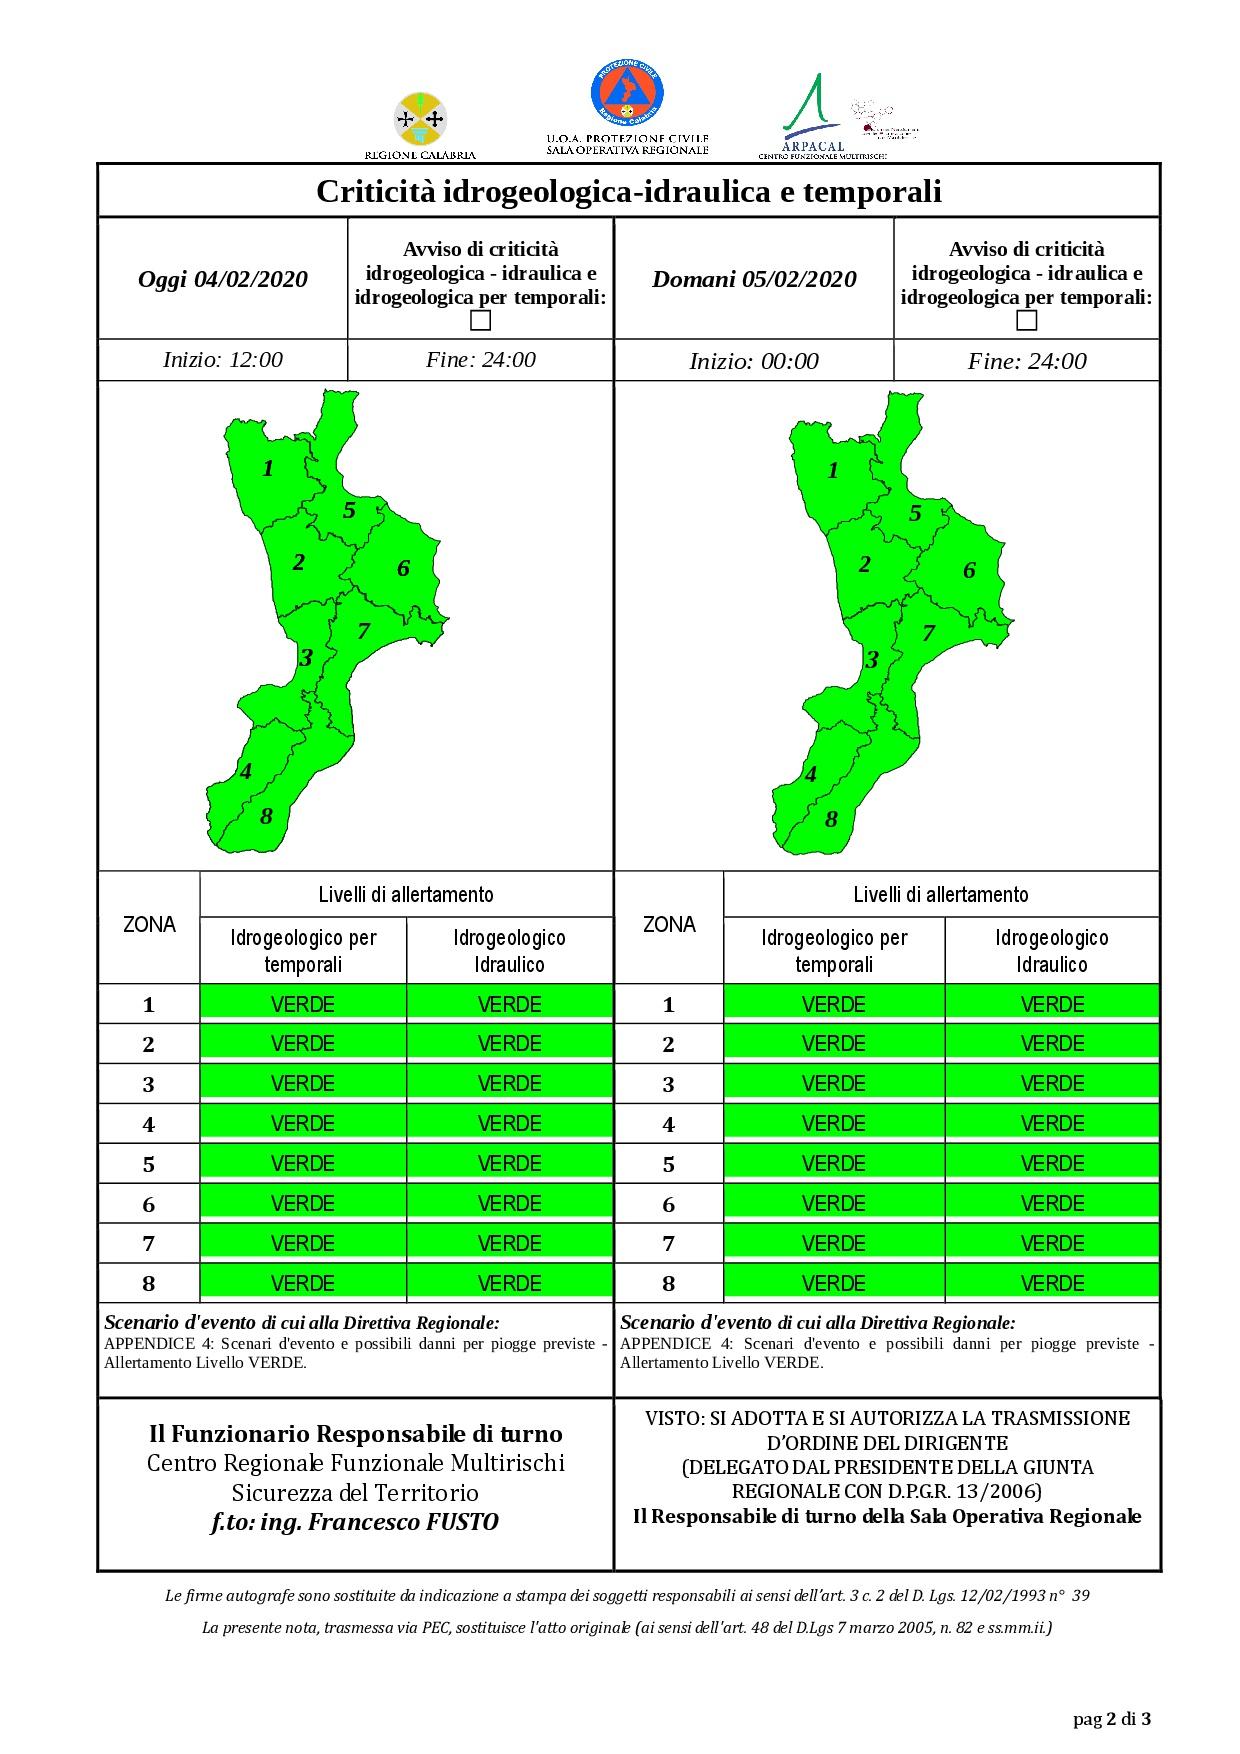 Criticità idrogeologica-idraulica e temporali in Calabria 04-02-2020